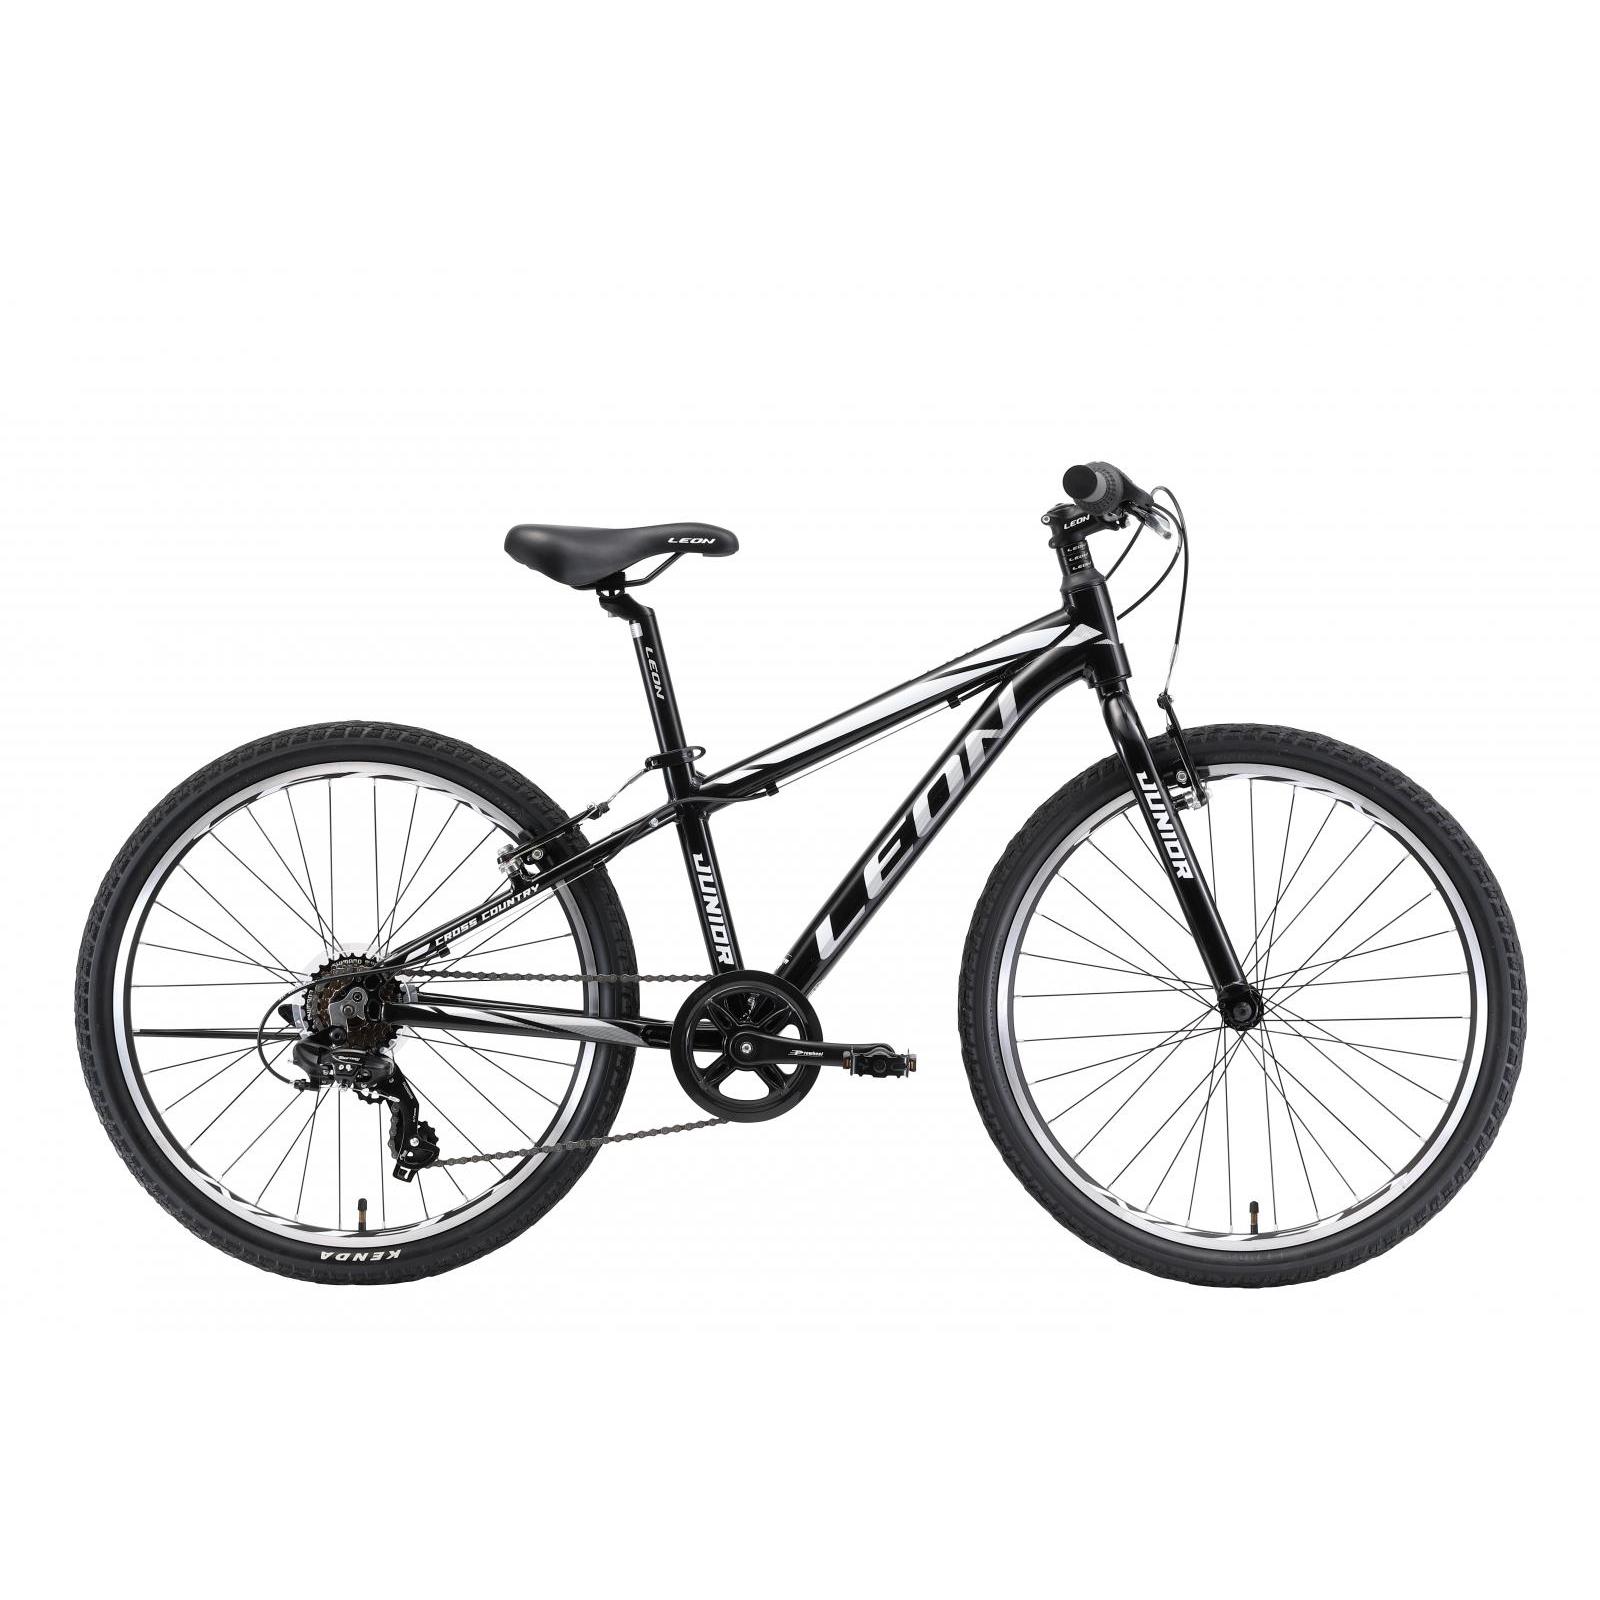 "Велосипед Leon 24"" JUNIOR 2018 14G Vbr рама-12,5"" Al чёрно-белый (OPS-LN-24-022)"